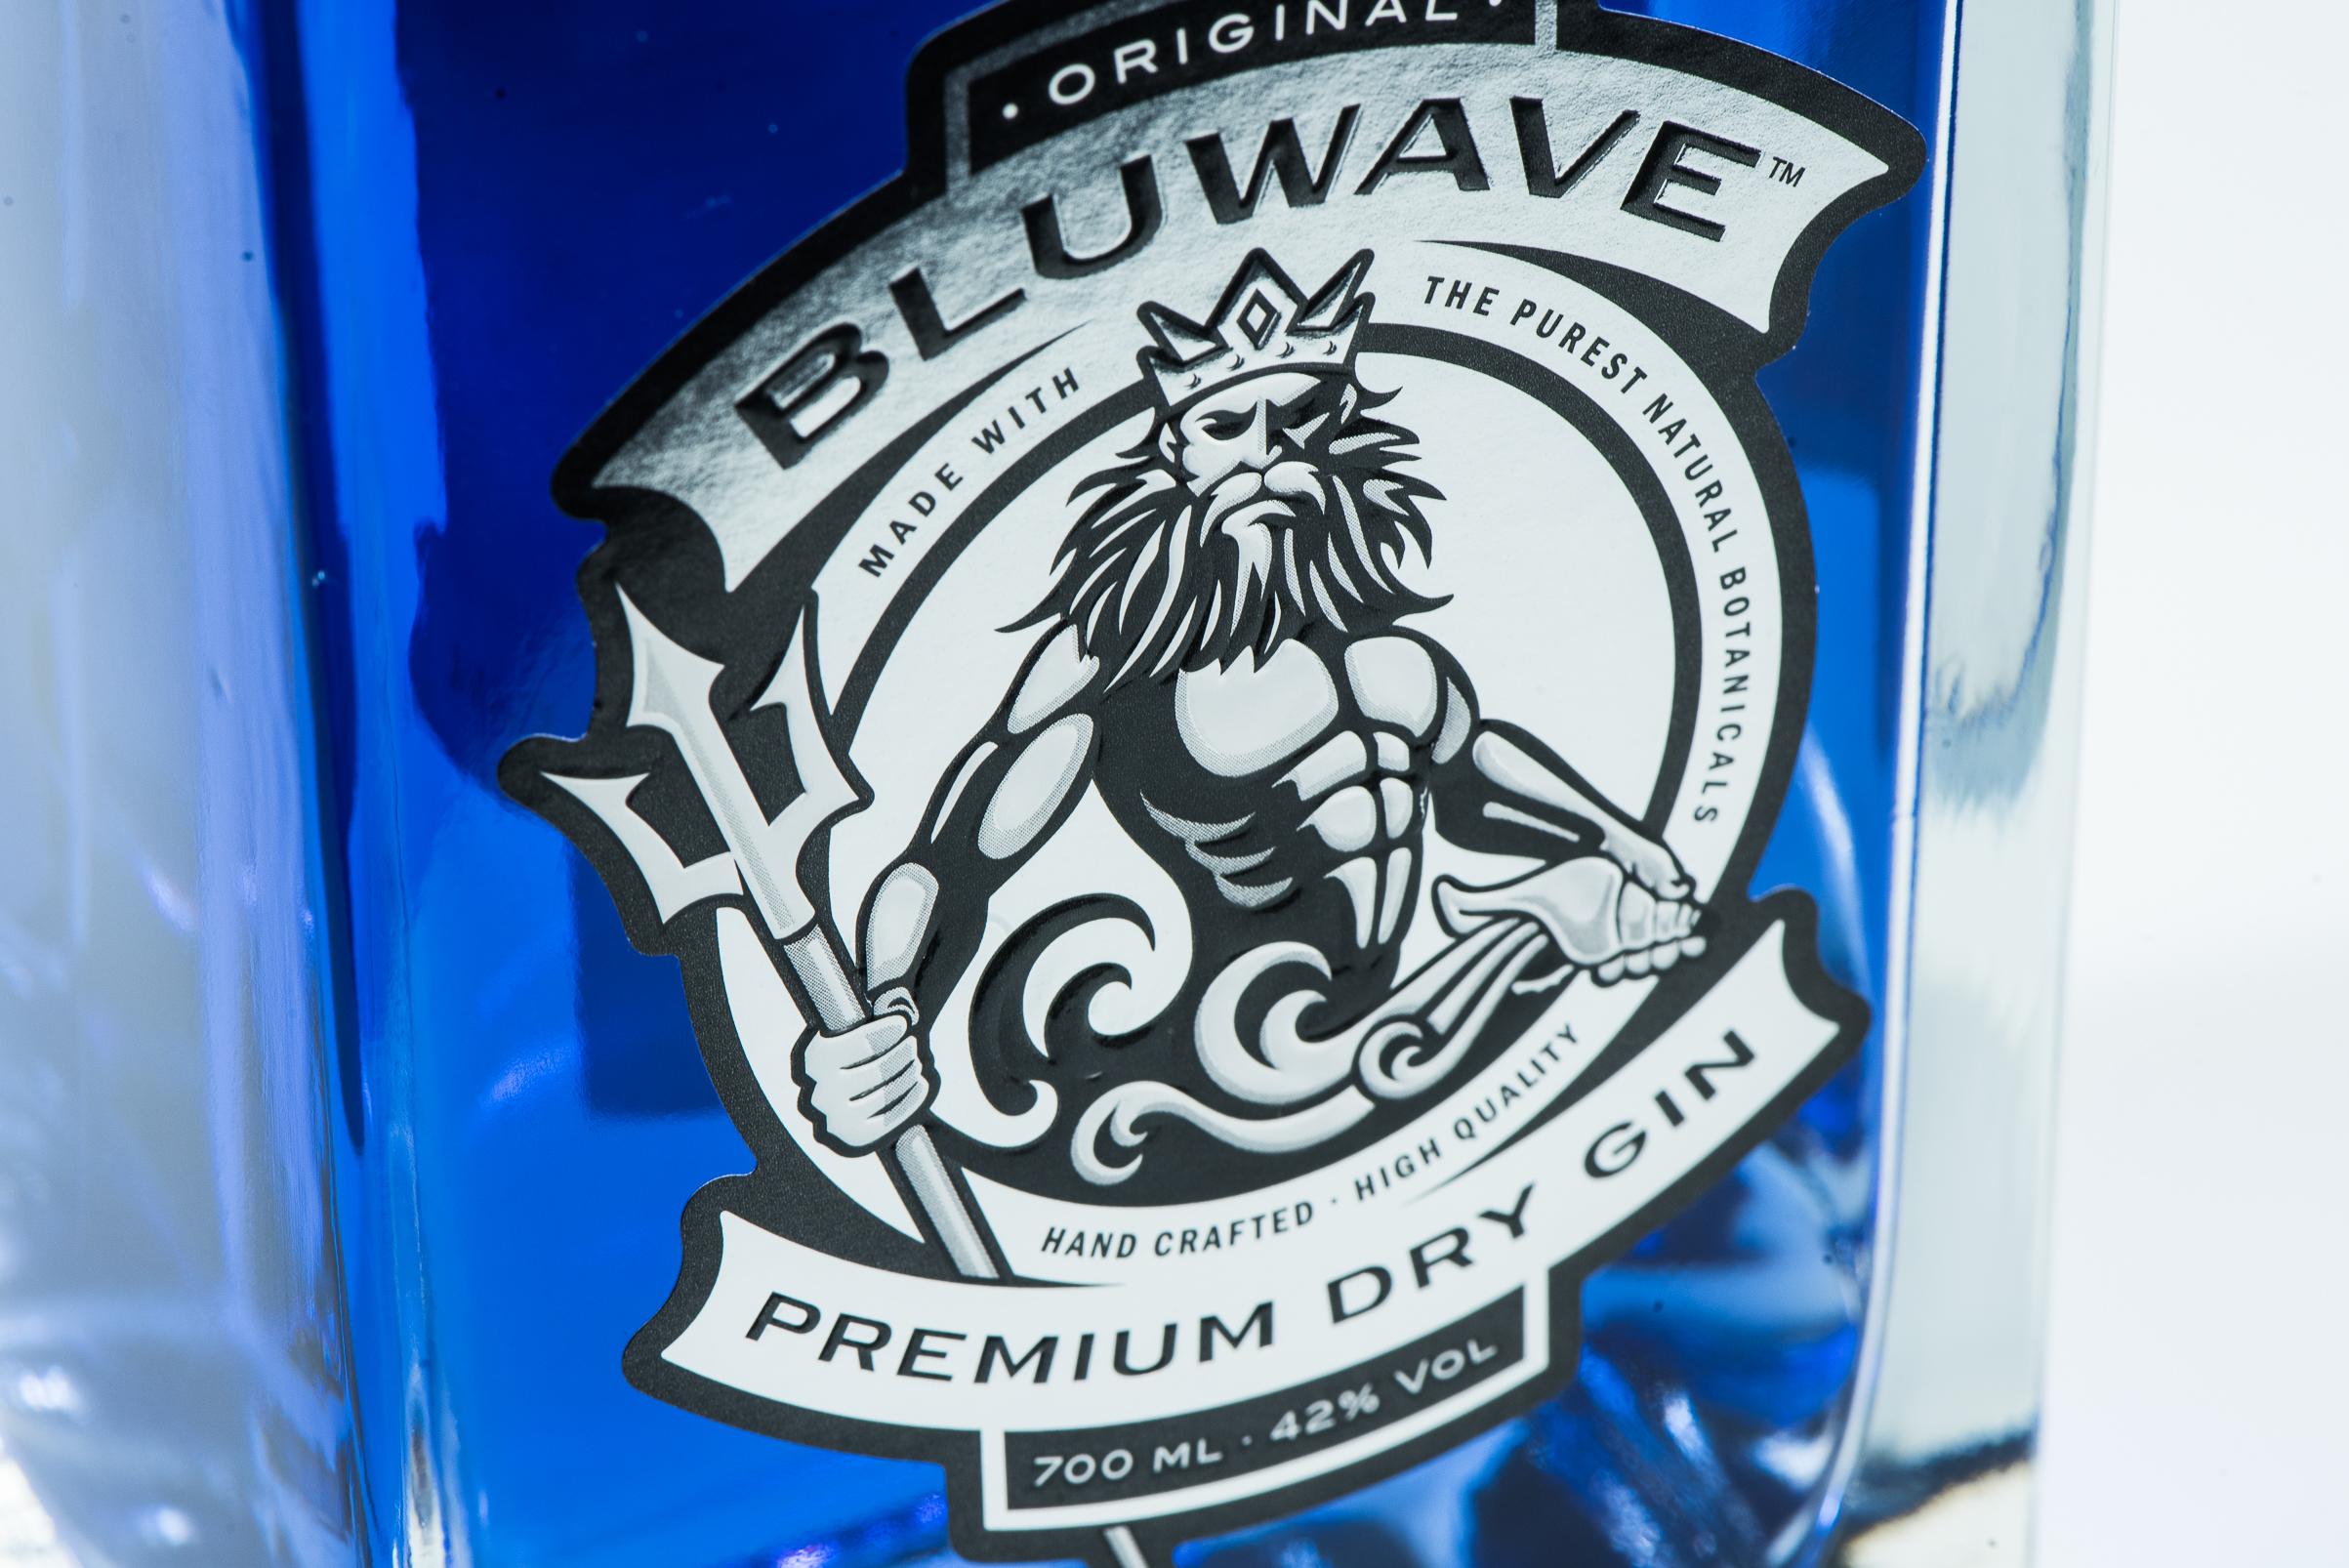 Bluwave